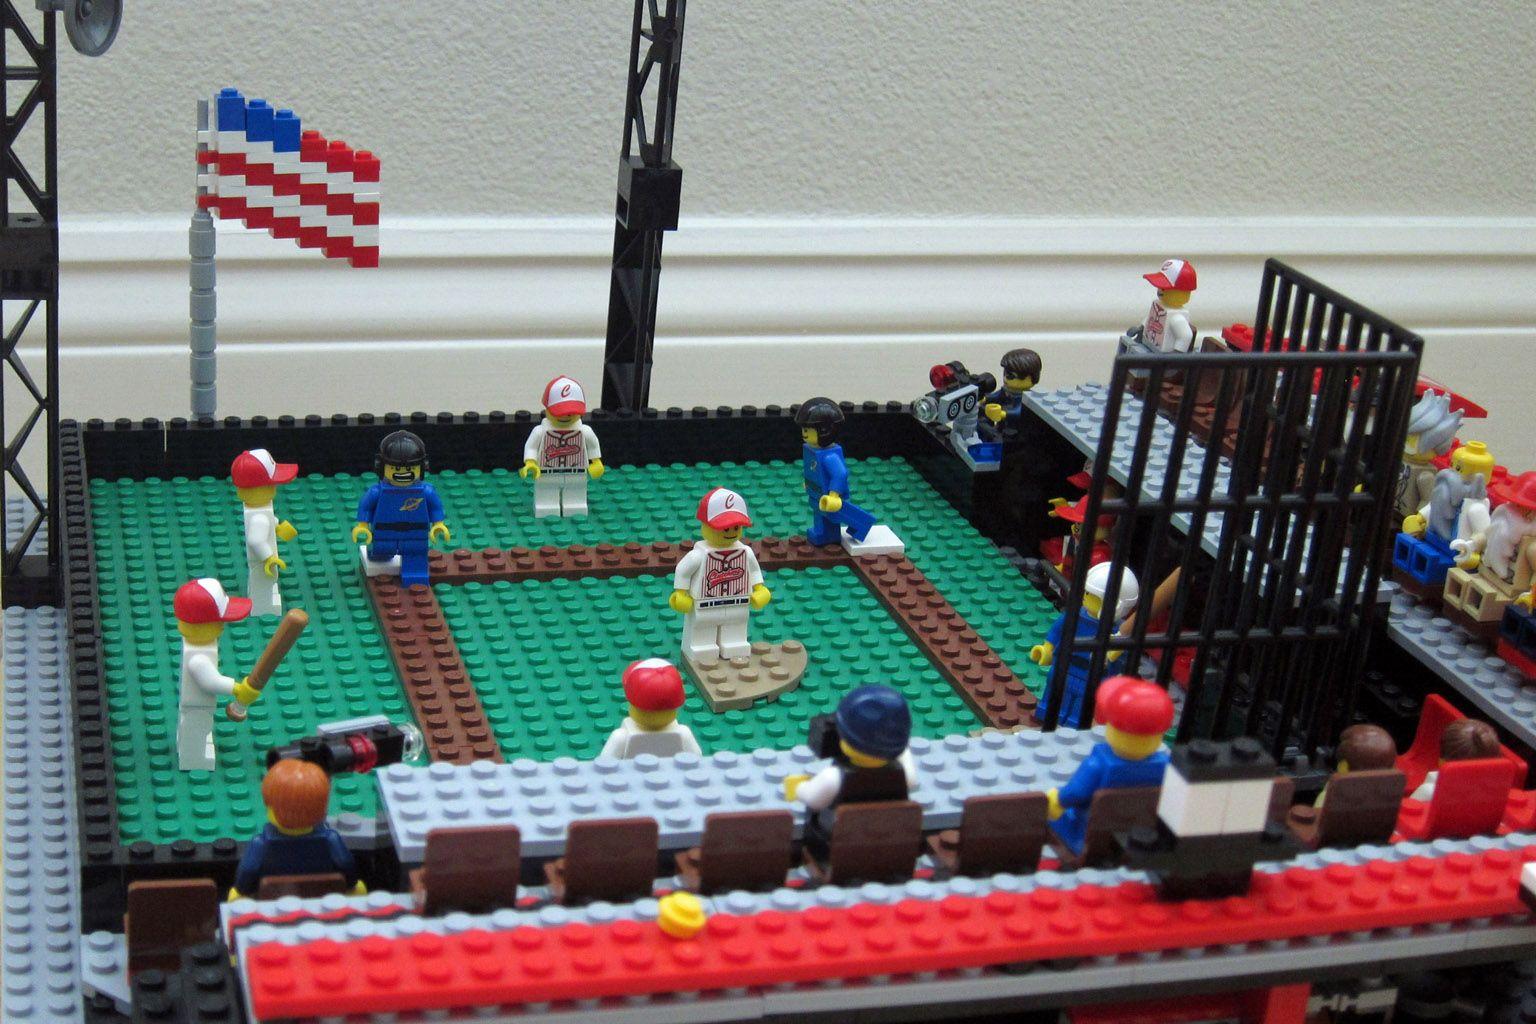 Baseball Stadium Baseball Stadium Lego Baseball Baseball Project